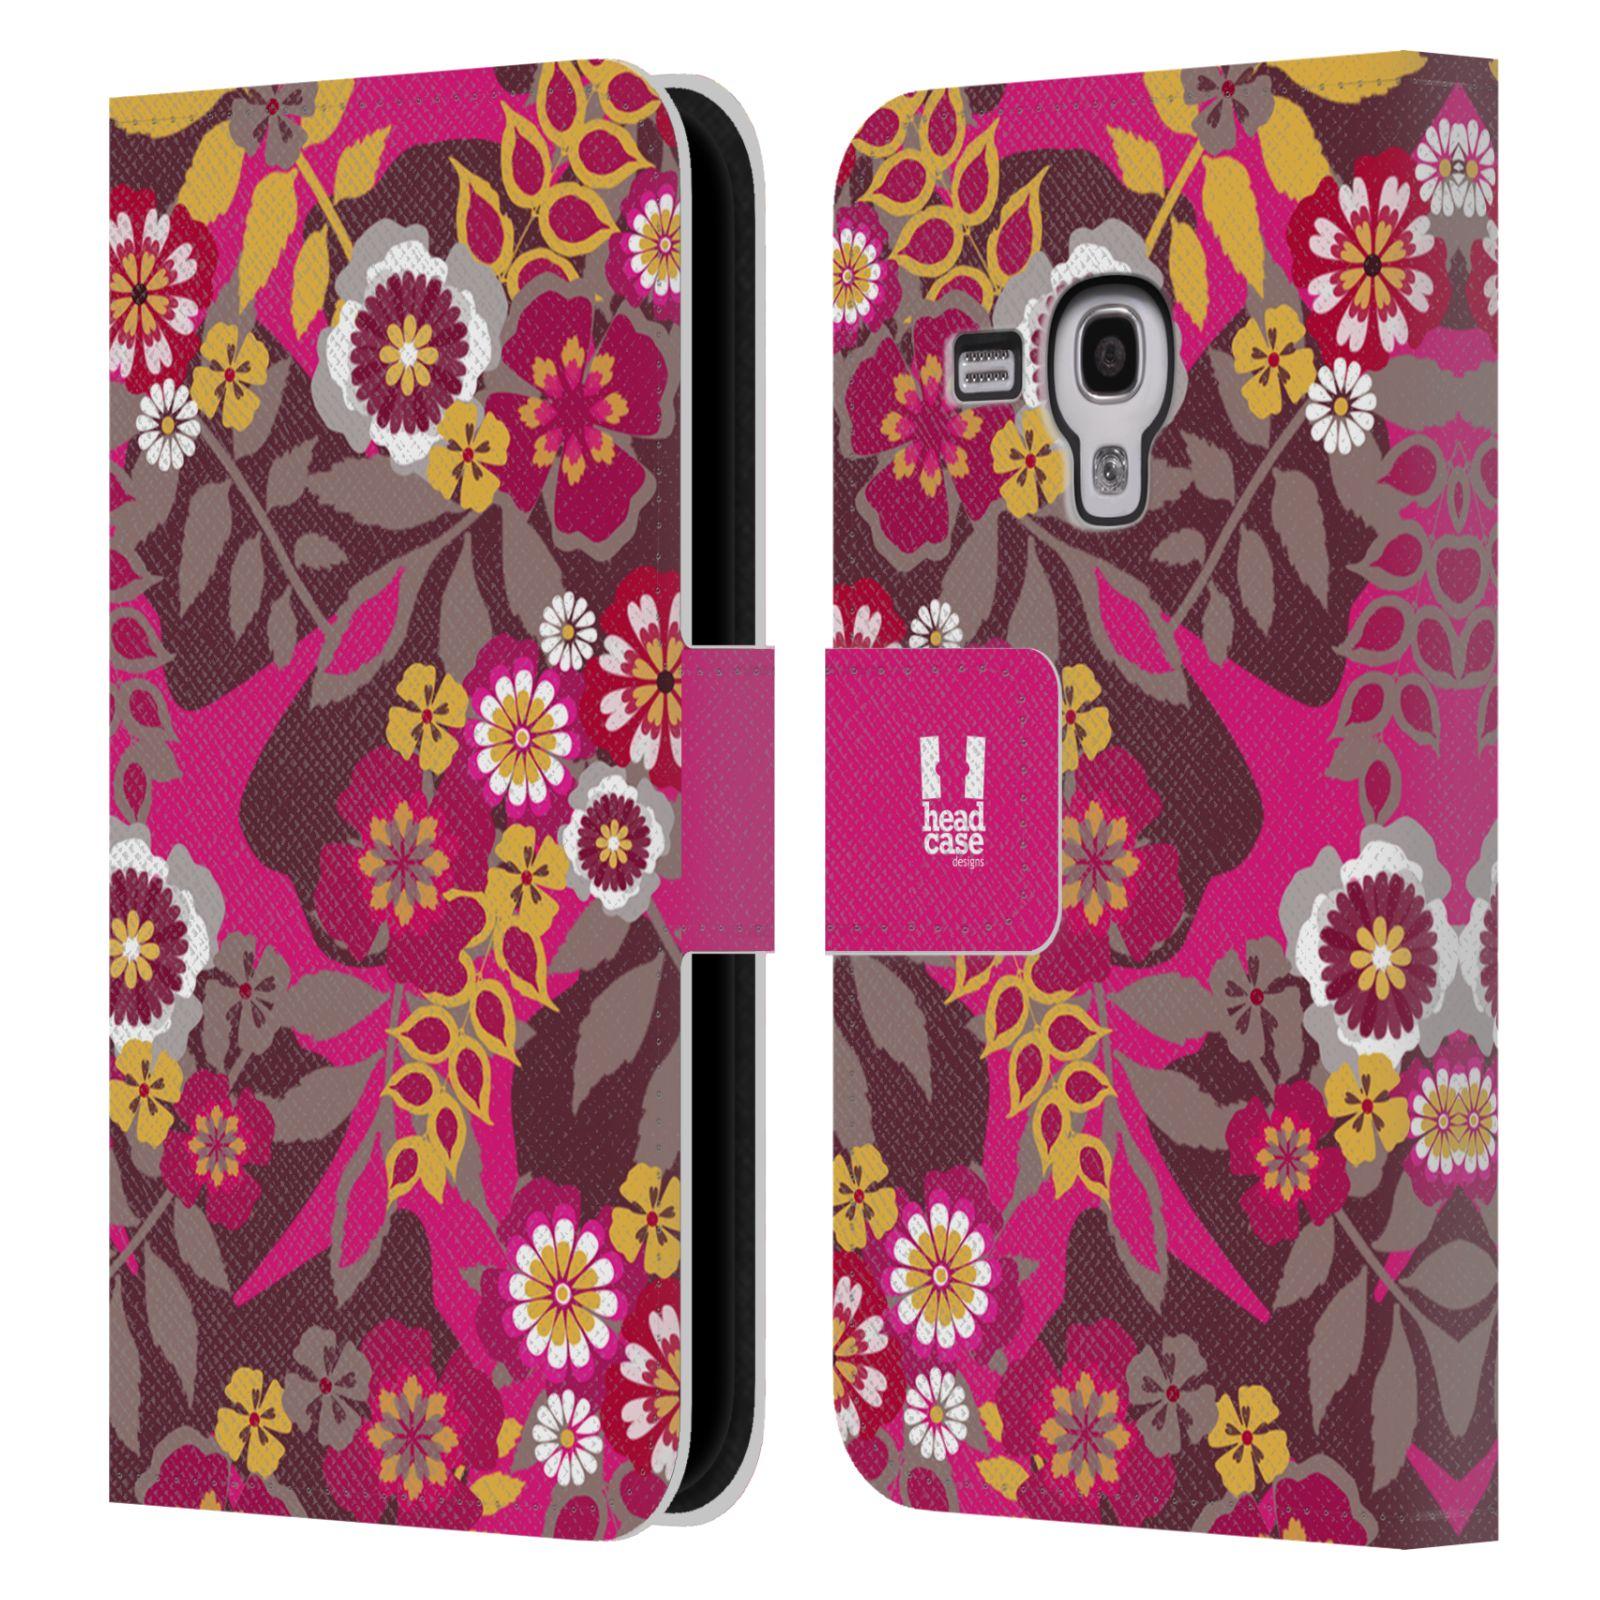 HEAD CASE Flipové pouzdro pro mobil Samsung Galaxy S3 MINI BOTANIKA růžová a hnědá